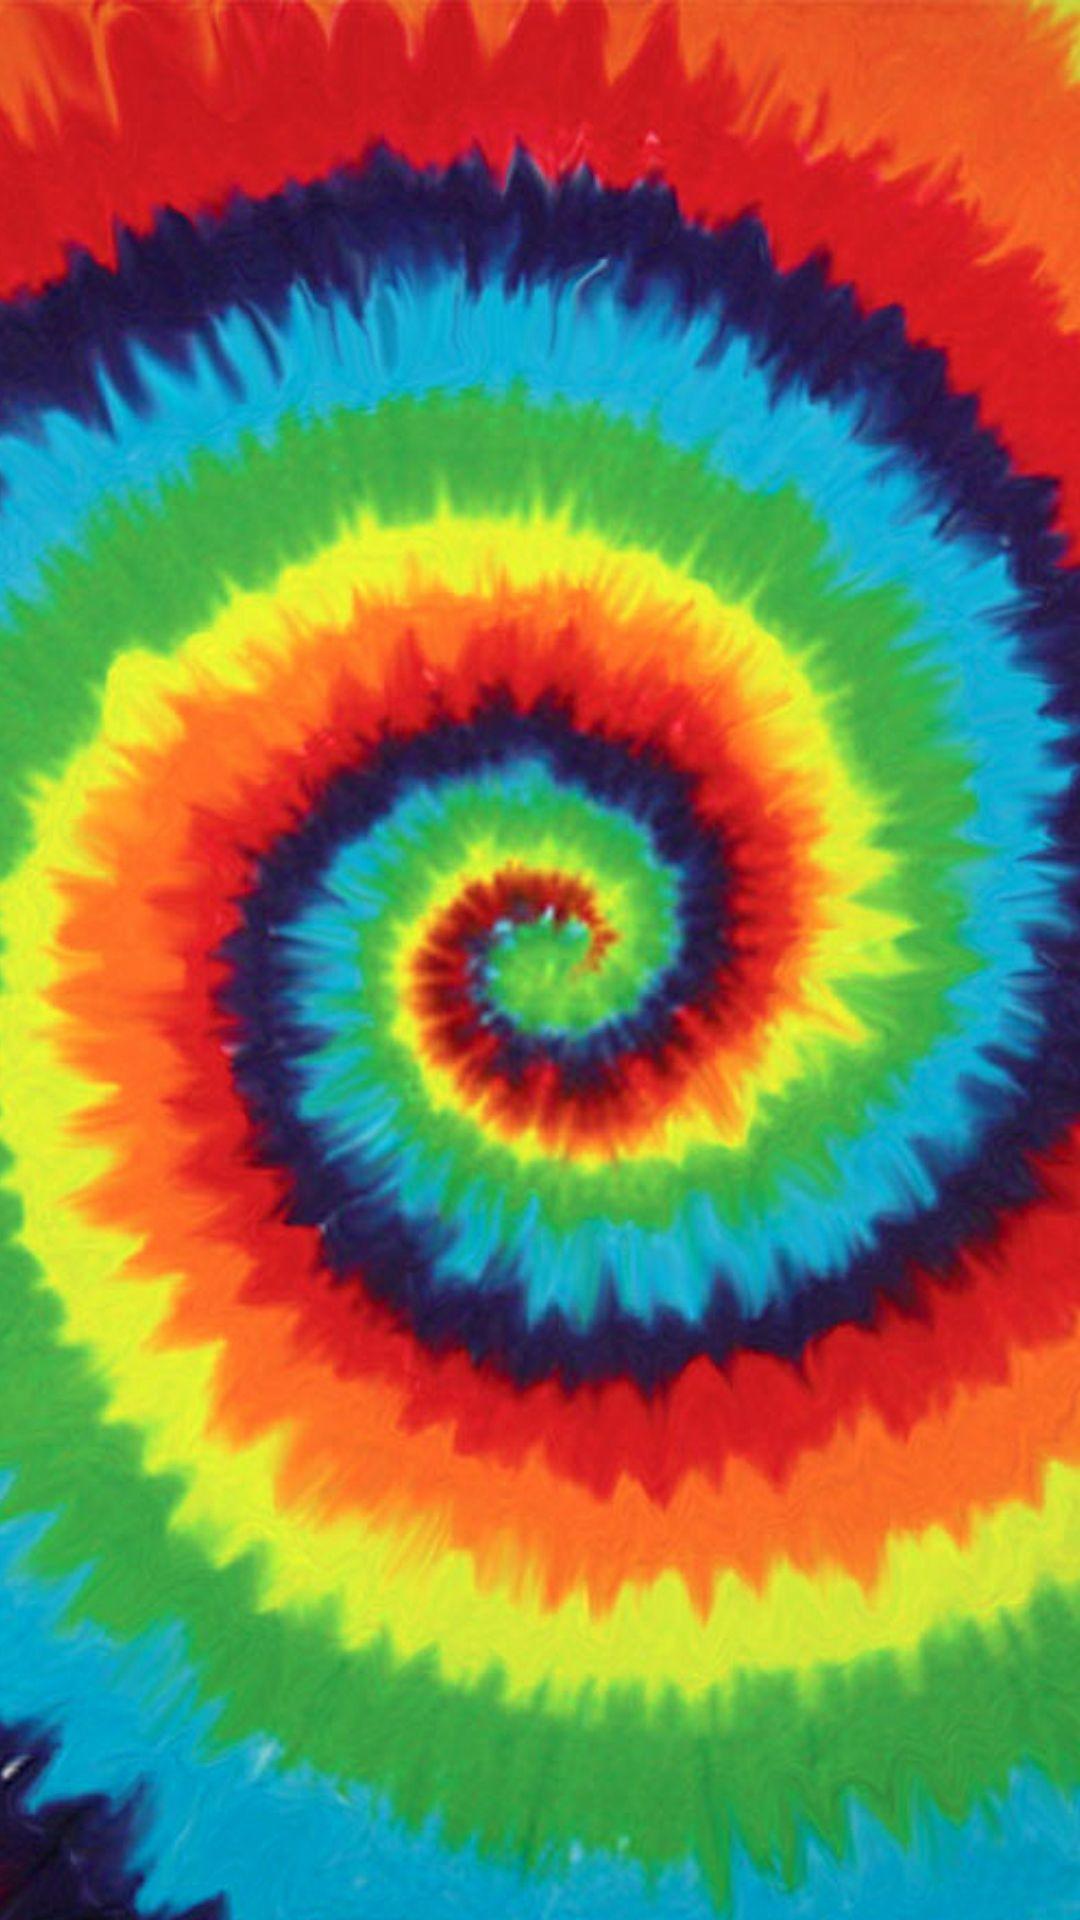 download Tie Dye Wallpapers Top Tie Dye Backgrounds 1080x1920